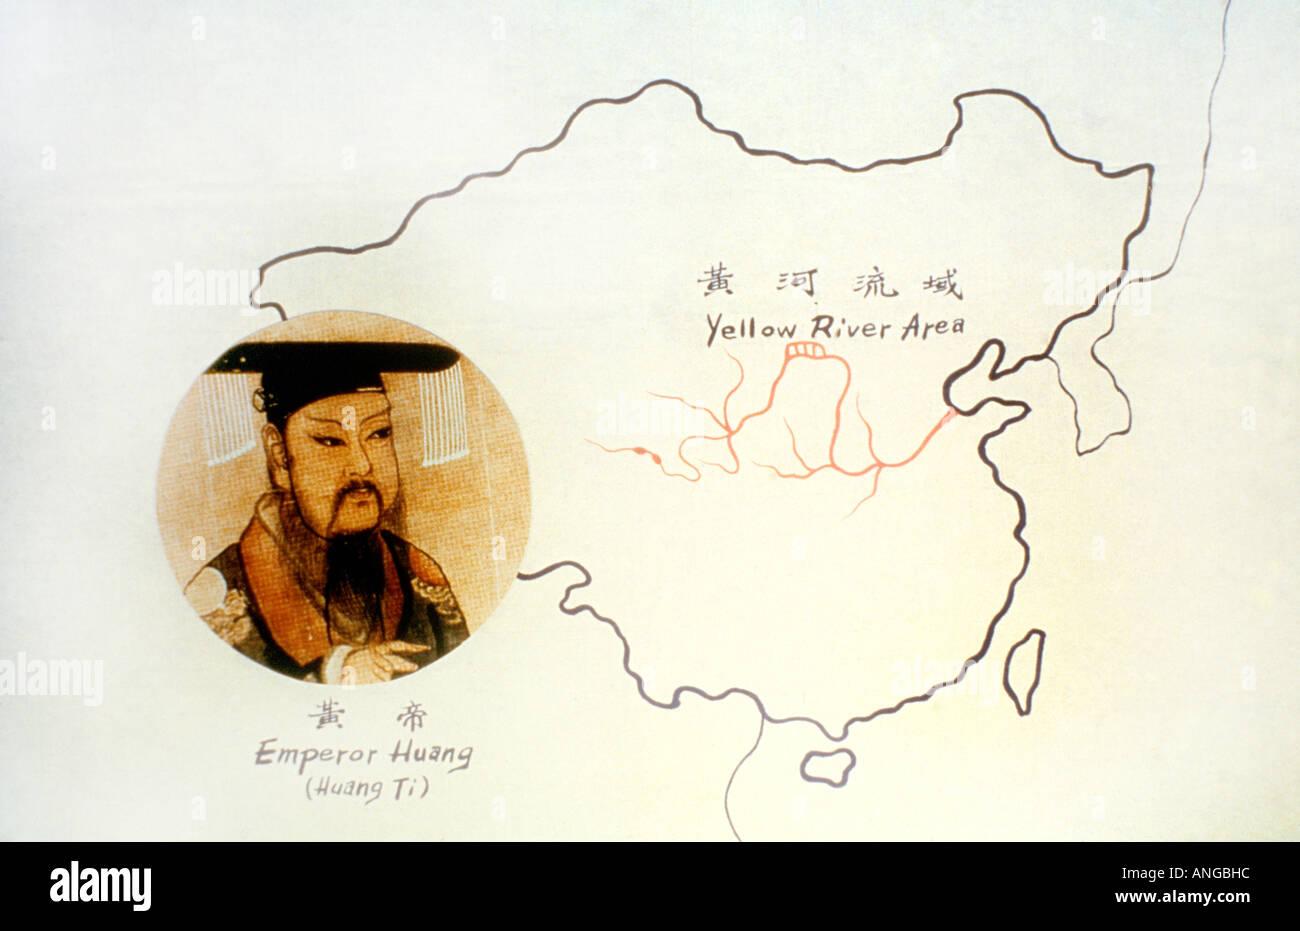 Taiwan Emperor Huang And Yellow River ( Yuang Ti ) - Stock Image